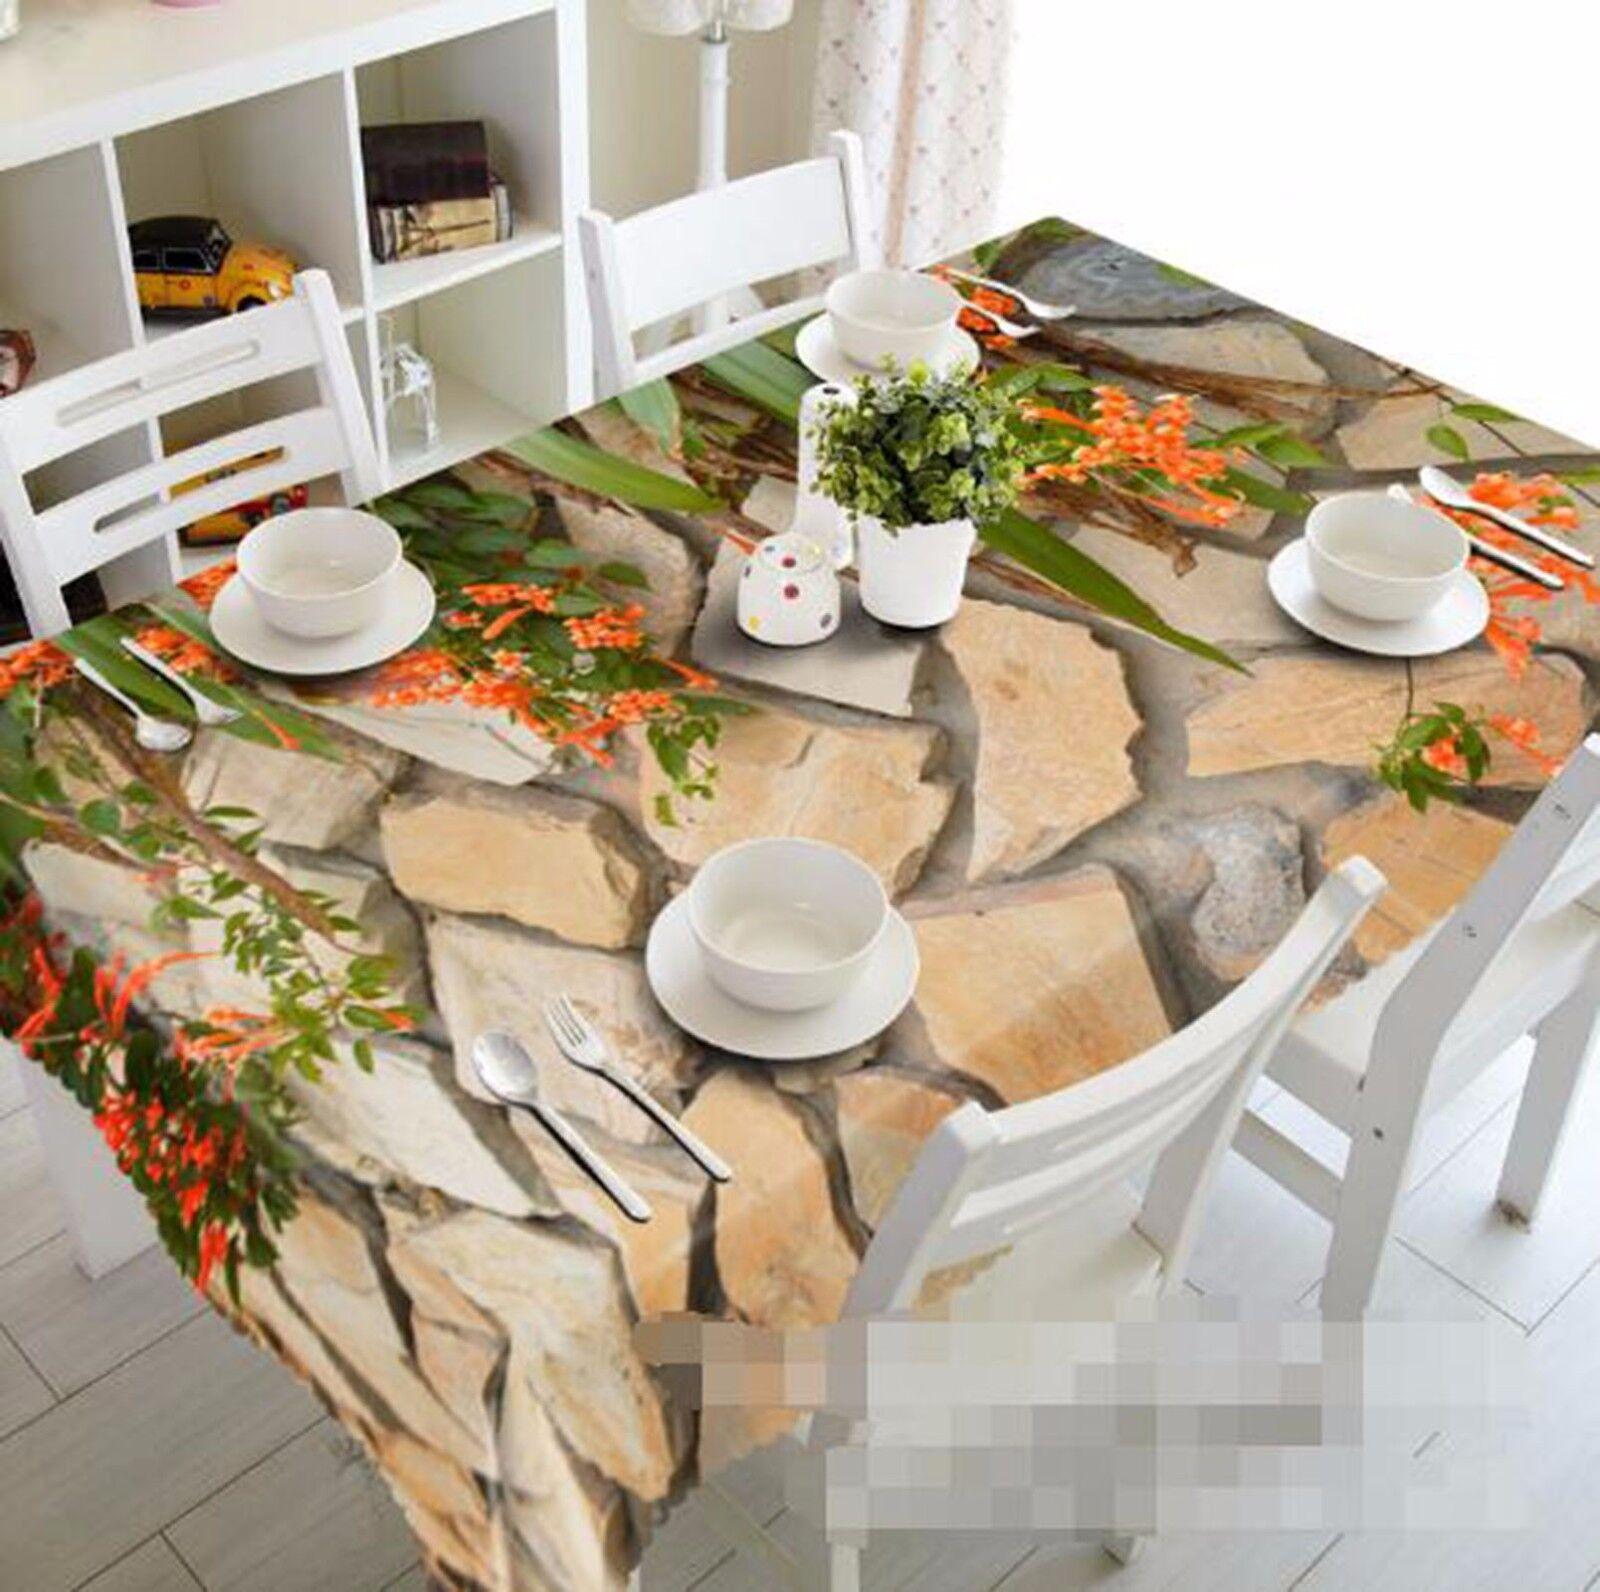 3D Wall Adorn Tablecloth Table Cover Cloth Birthday Party AJ WALLPAPER UK Lemon